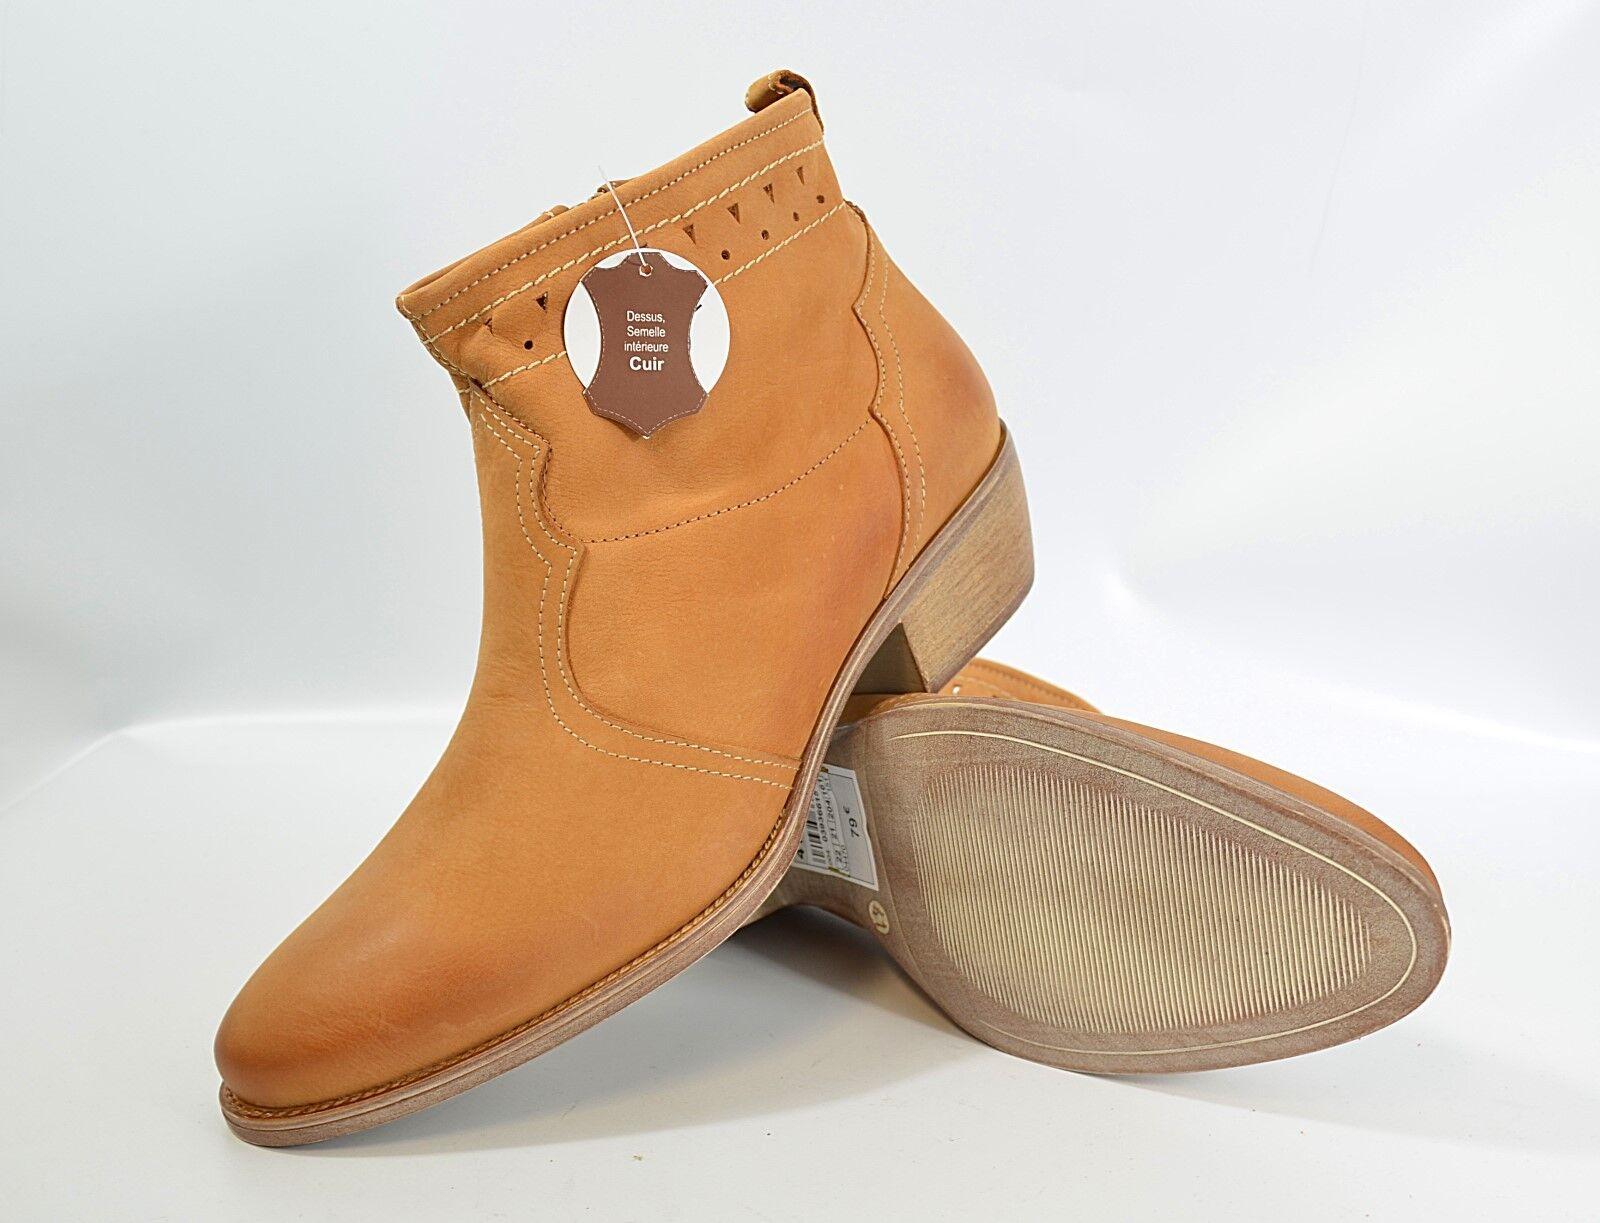 CREEKS Stiefel Gr. 41 Stiefeletten, Leder   Damen Schuhe (R6) 5/17 M2